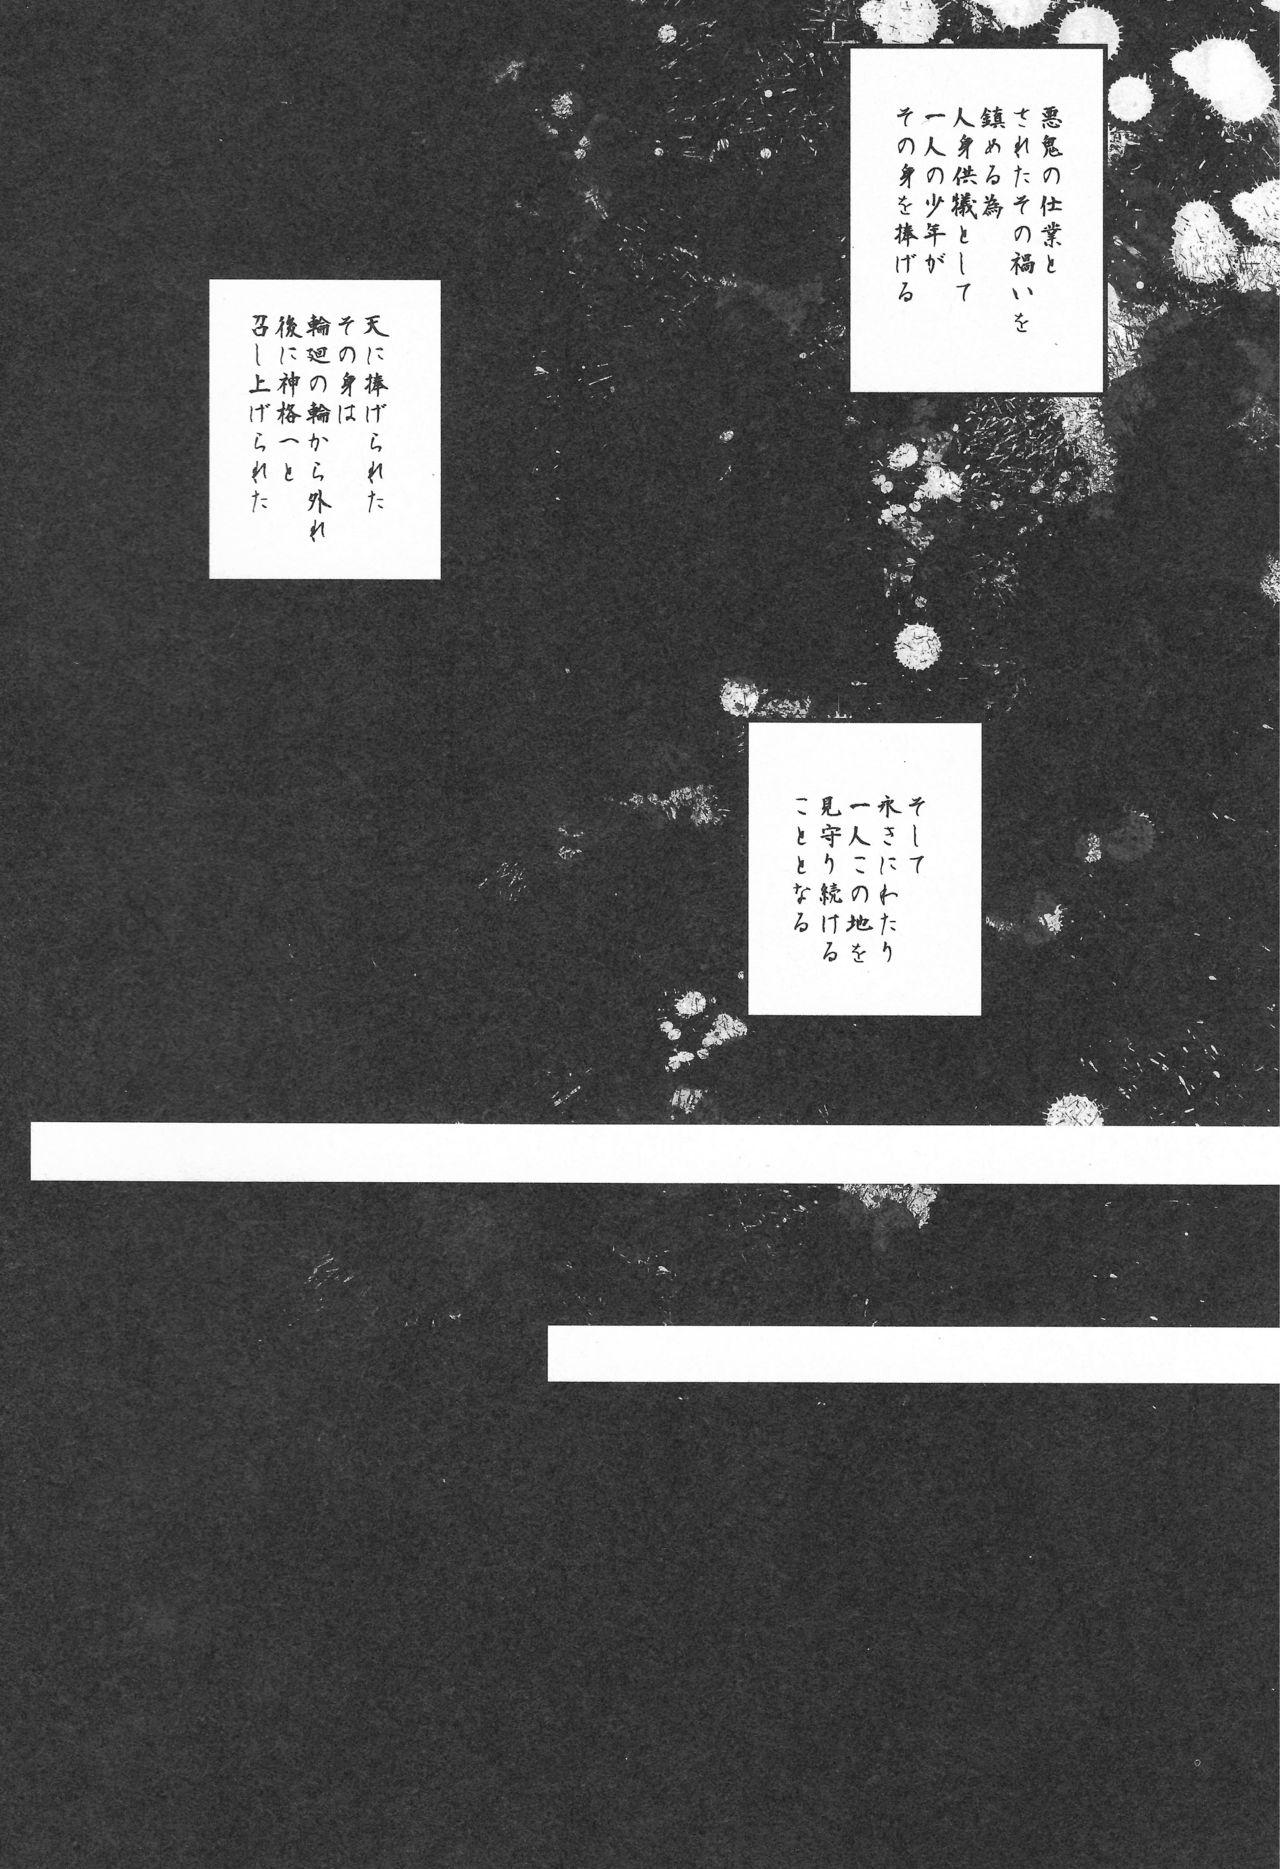 yoiyoi bougetu 4